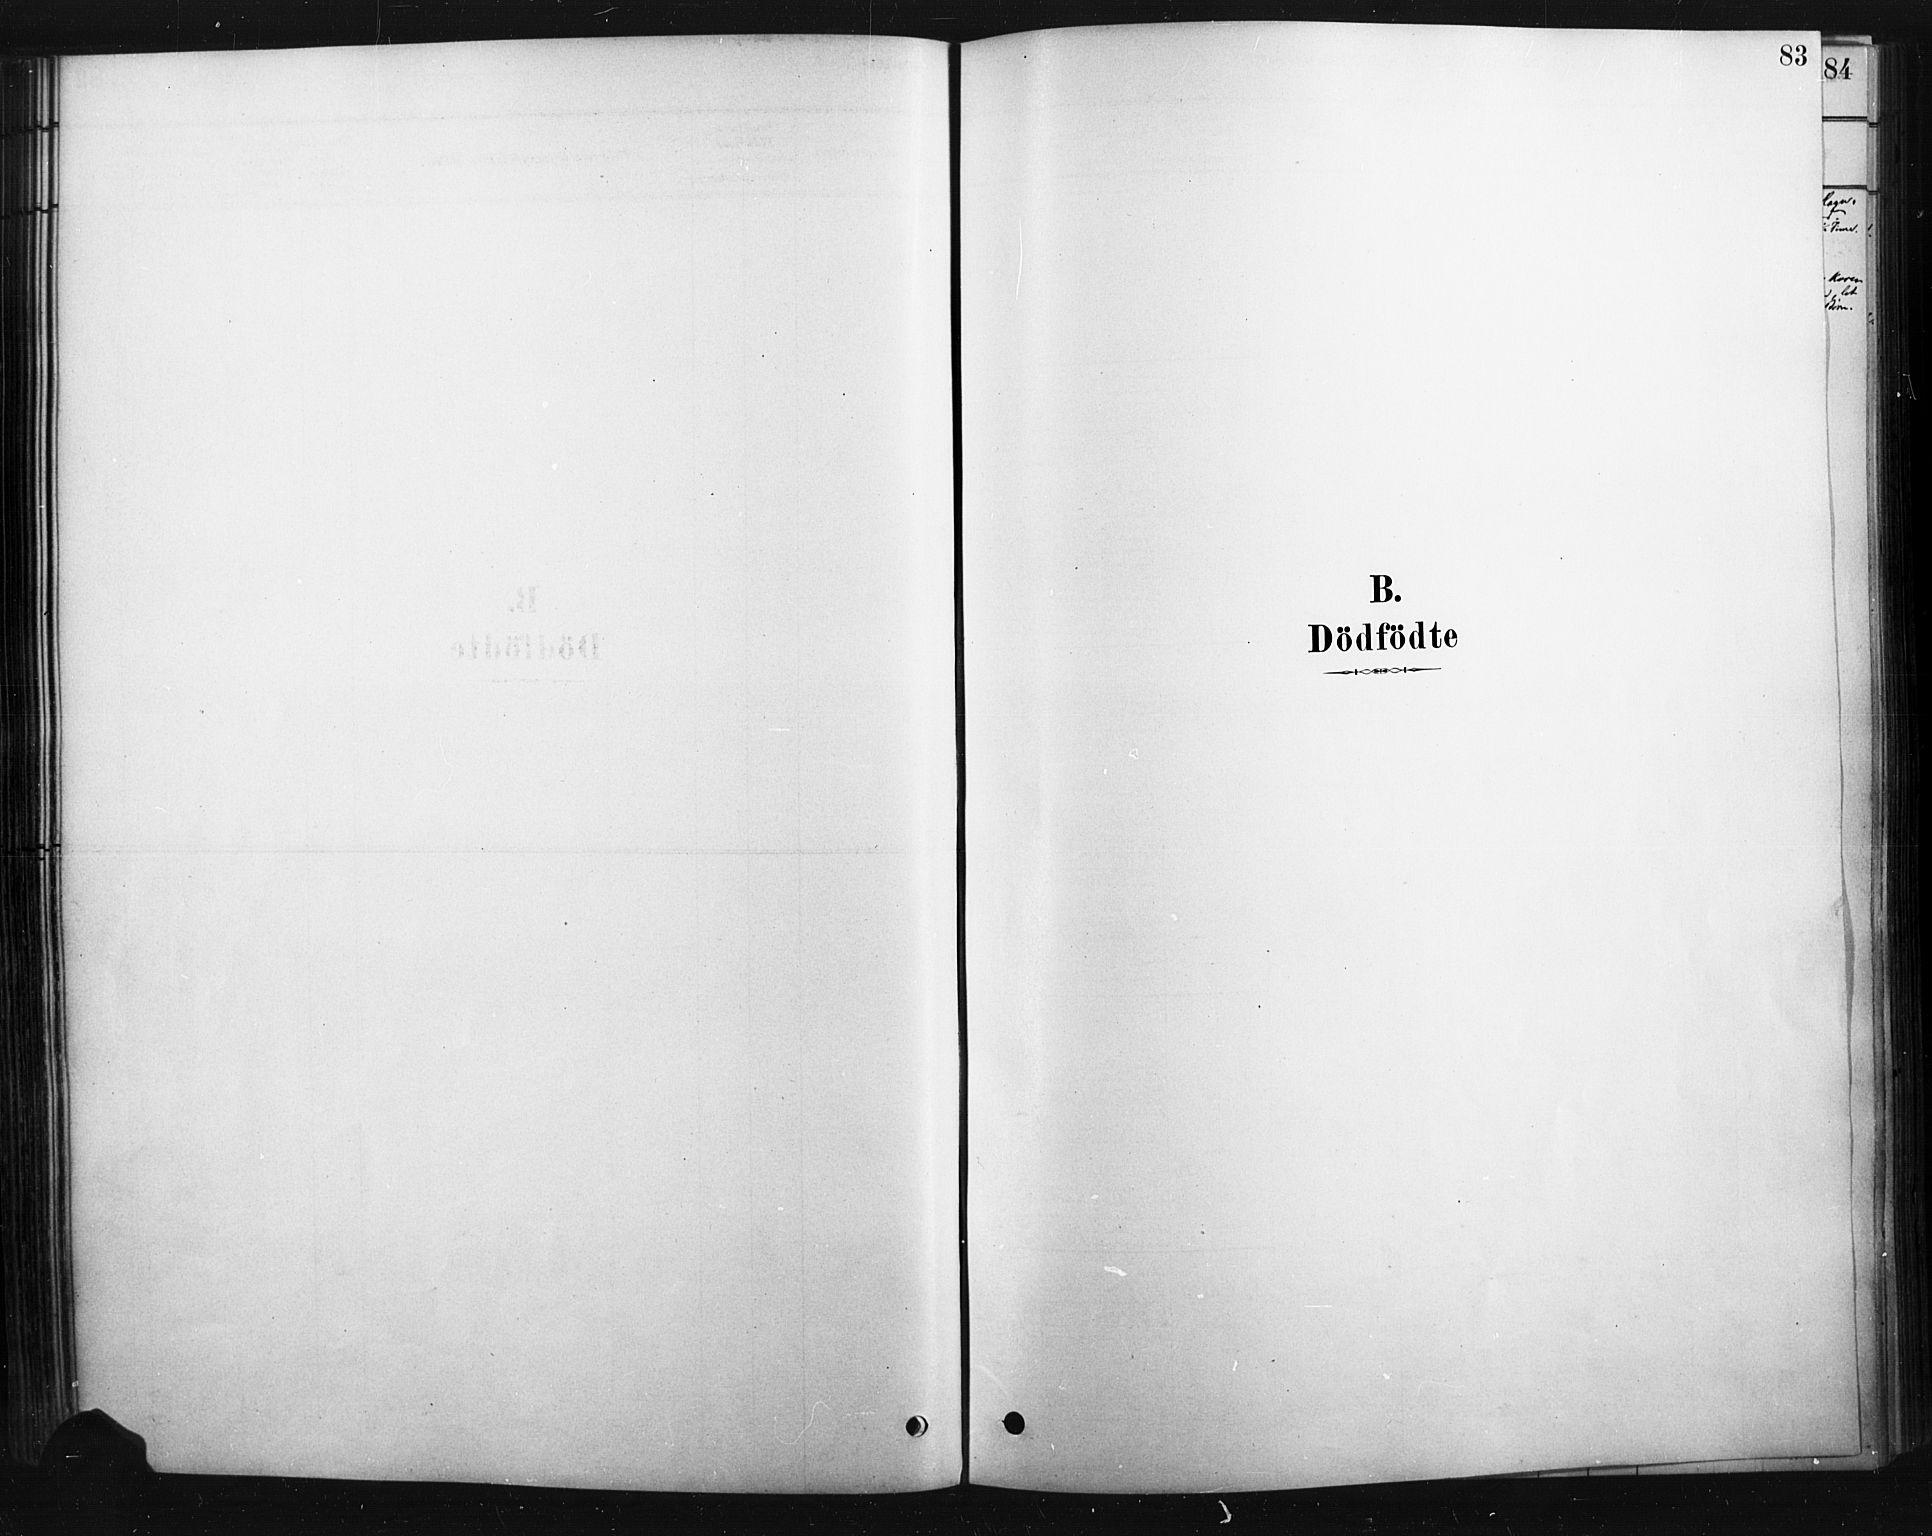 SAH, Rendalen prestekontor, H/Ha/Haa/L0010: Parish register (official) no. 10, 1878-1901, p. 83